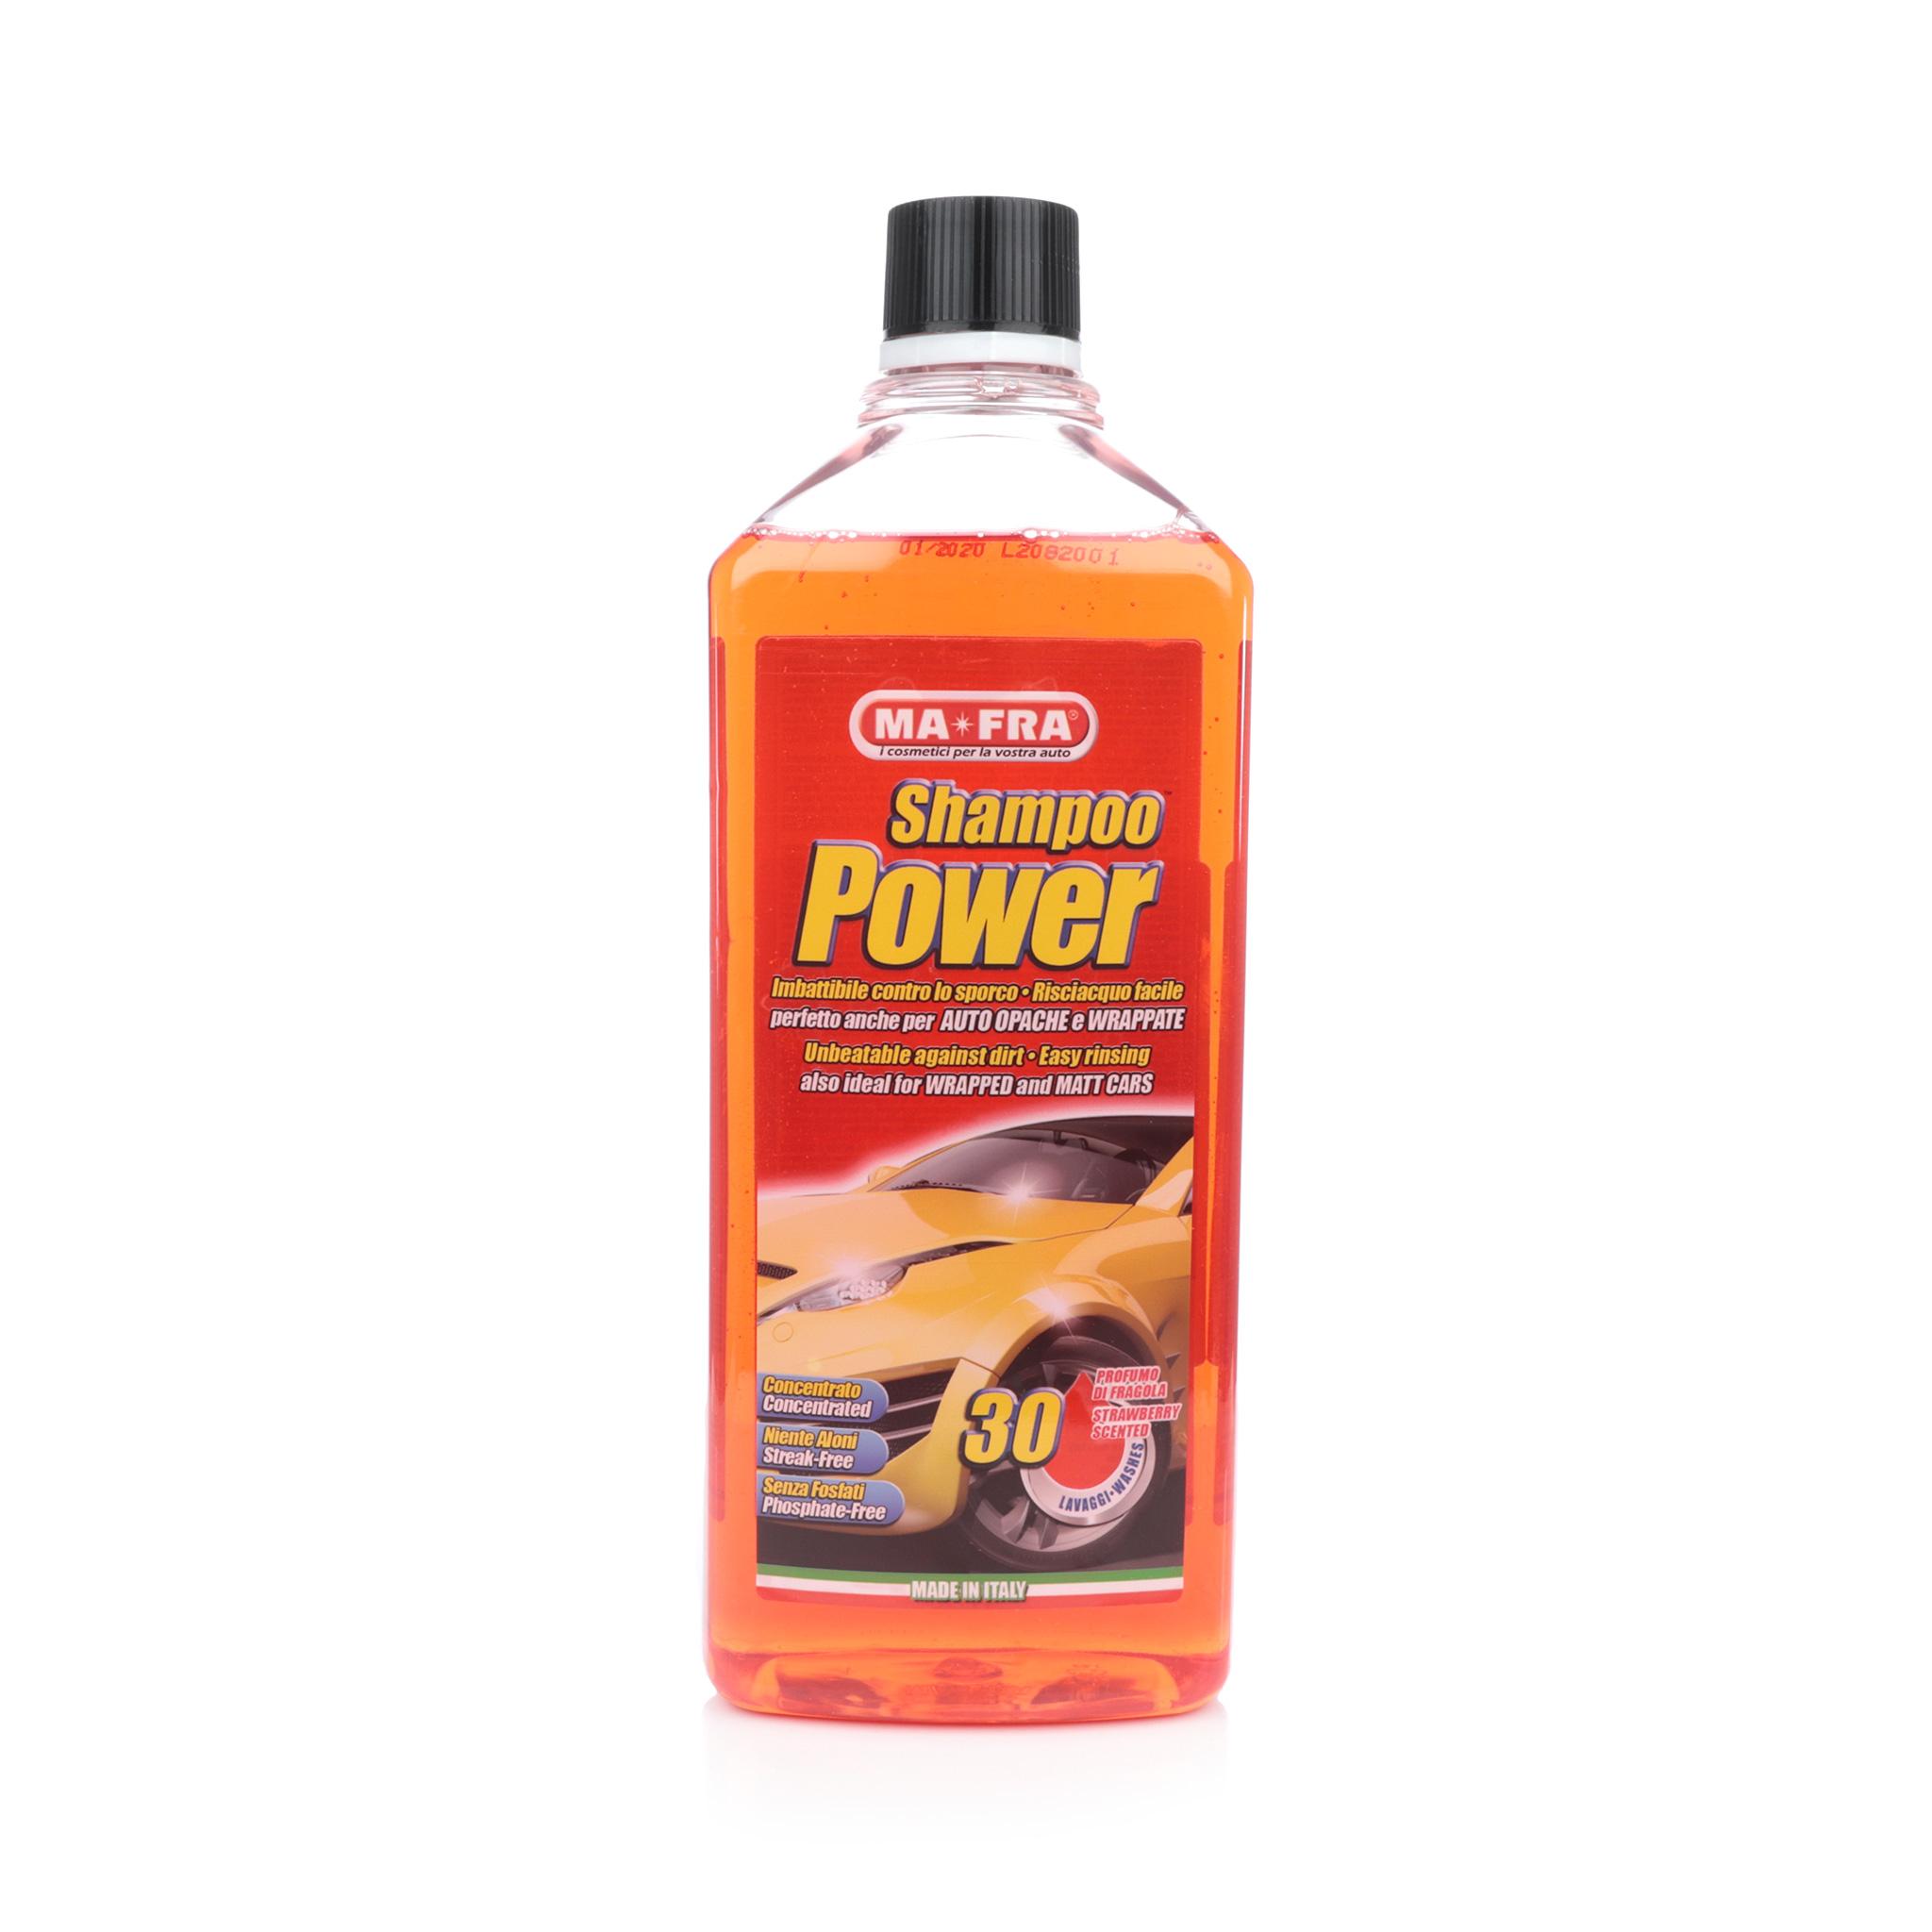 Bilschampo Mafra Shampoo Power, 1000 ml